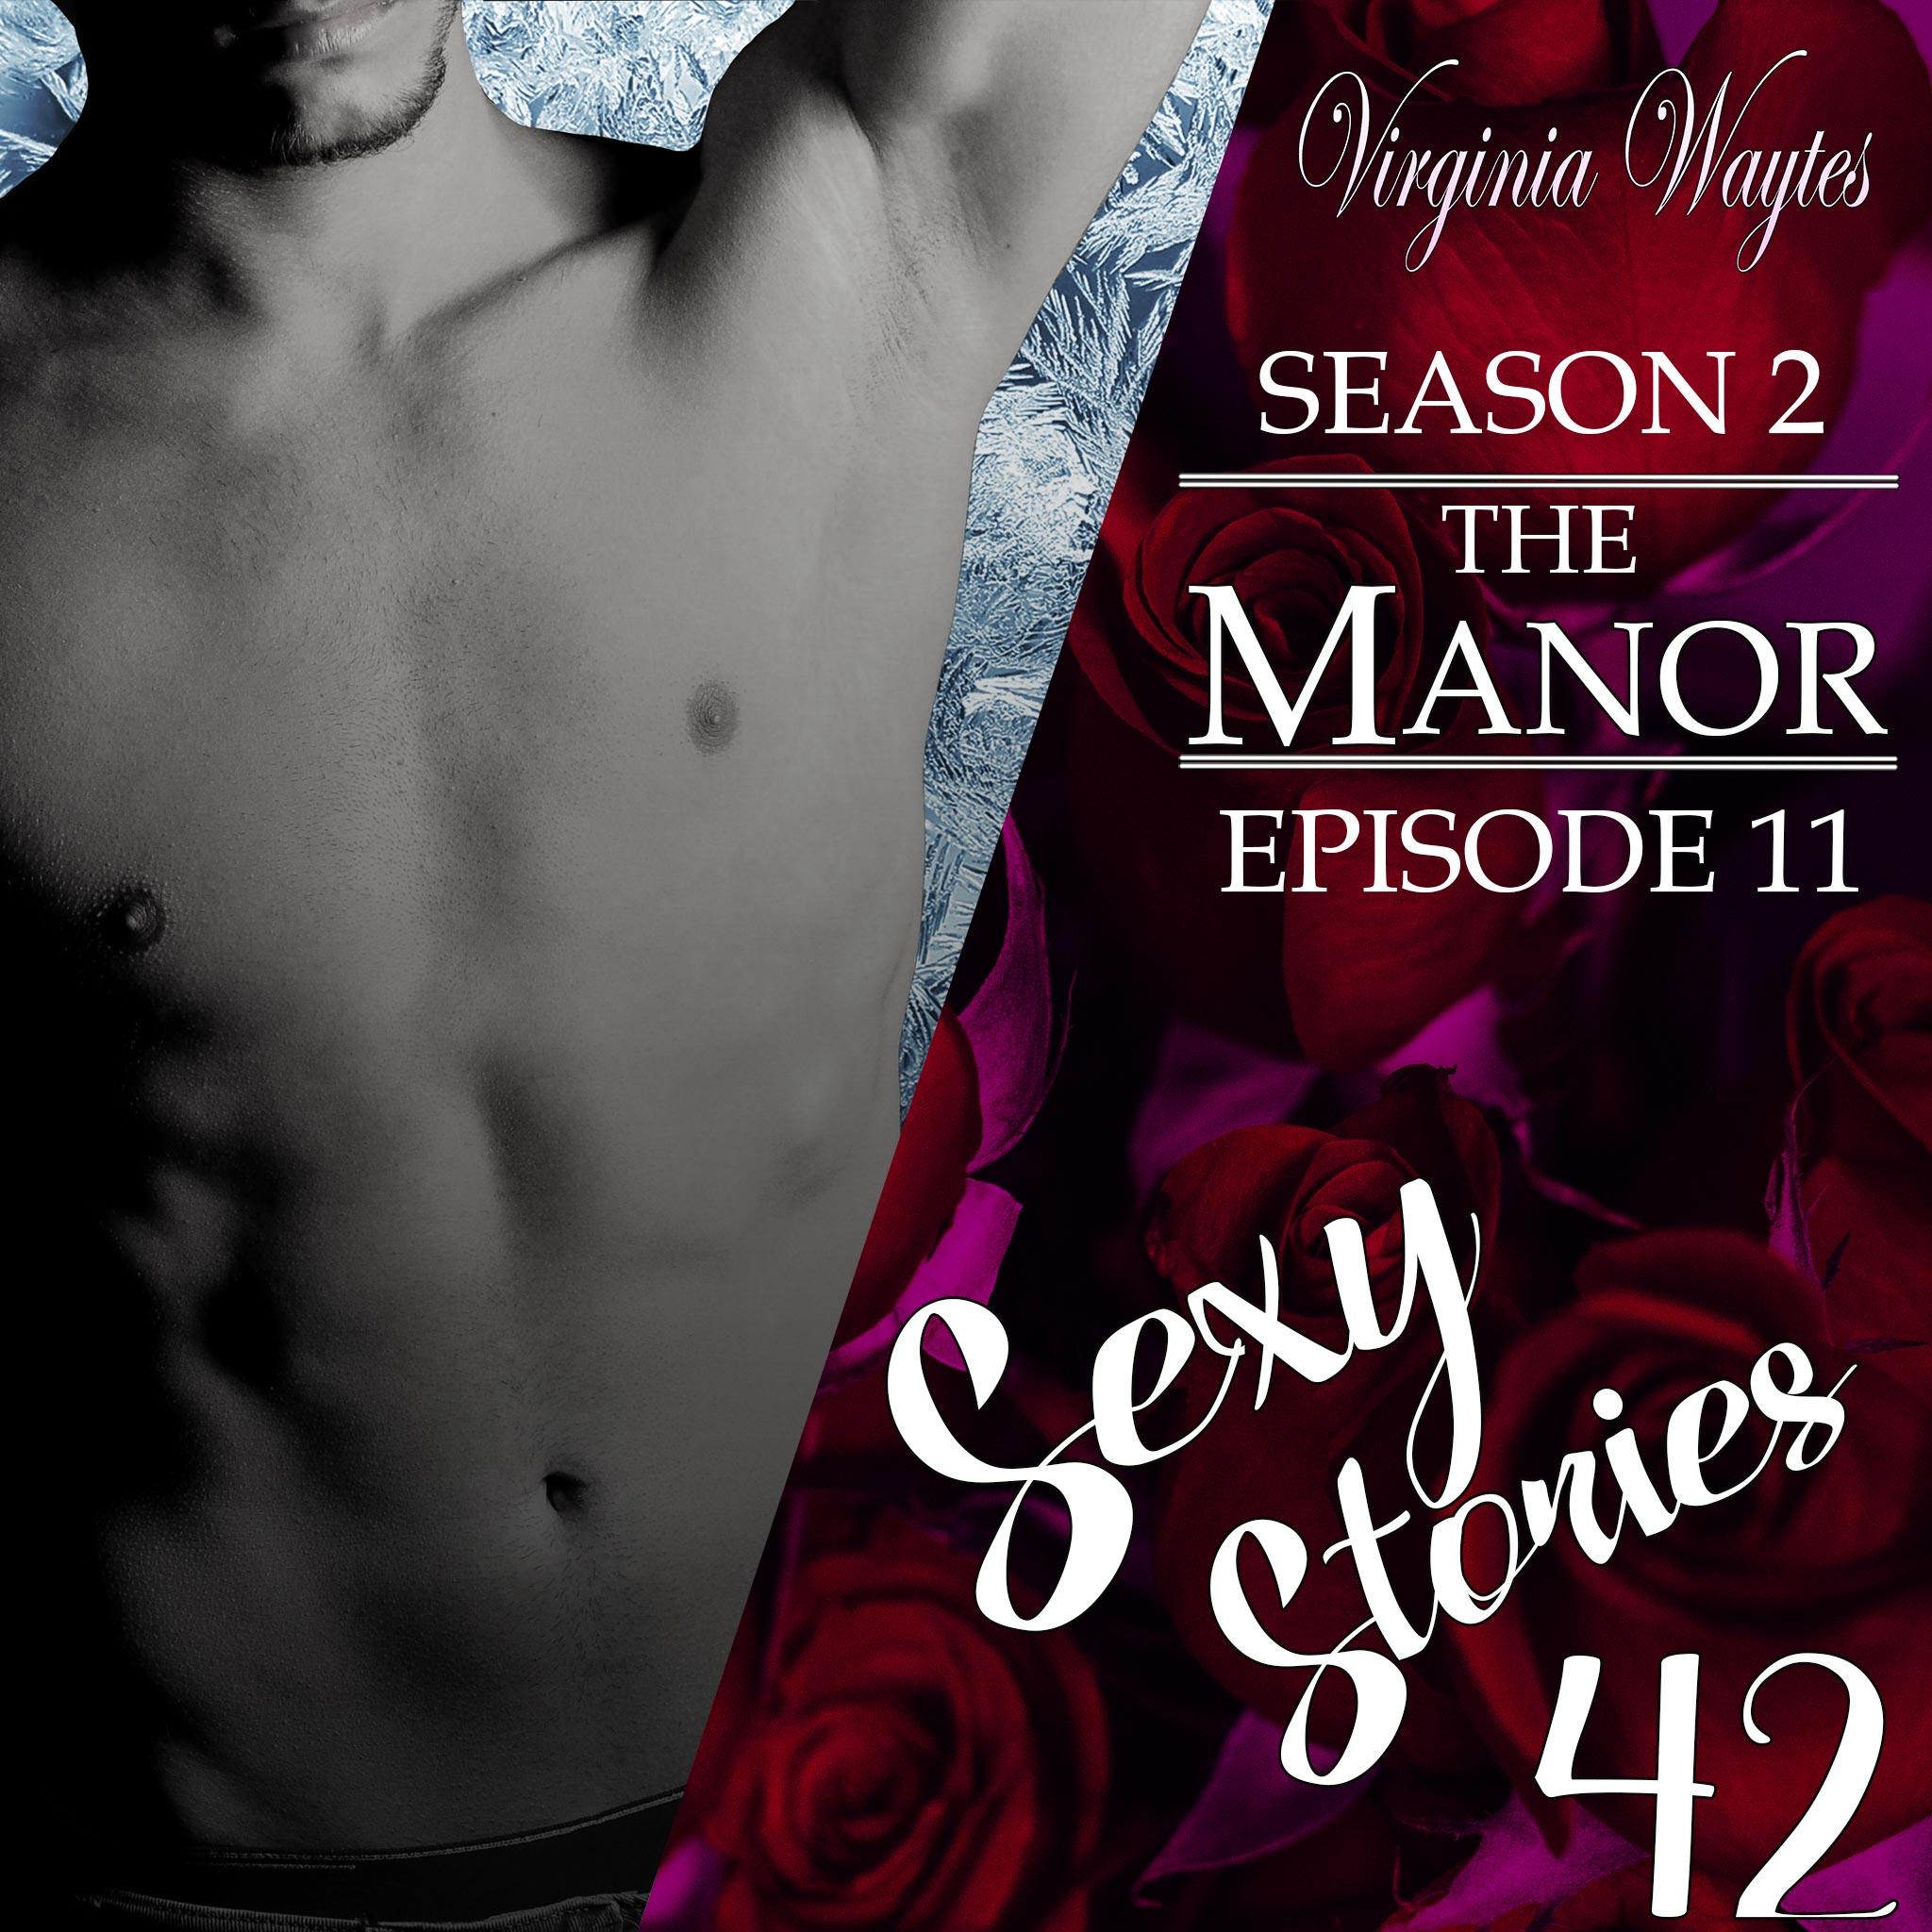 Sexy Stories 42 Transcript